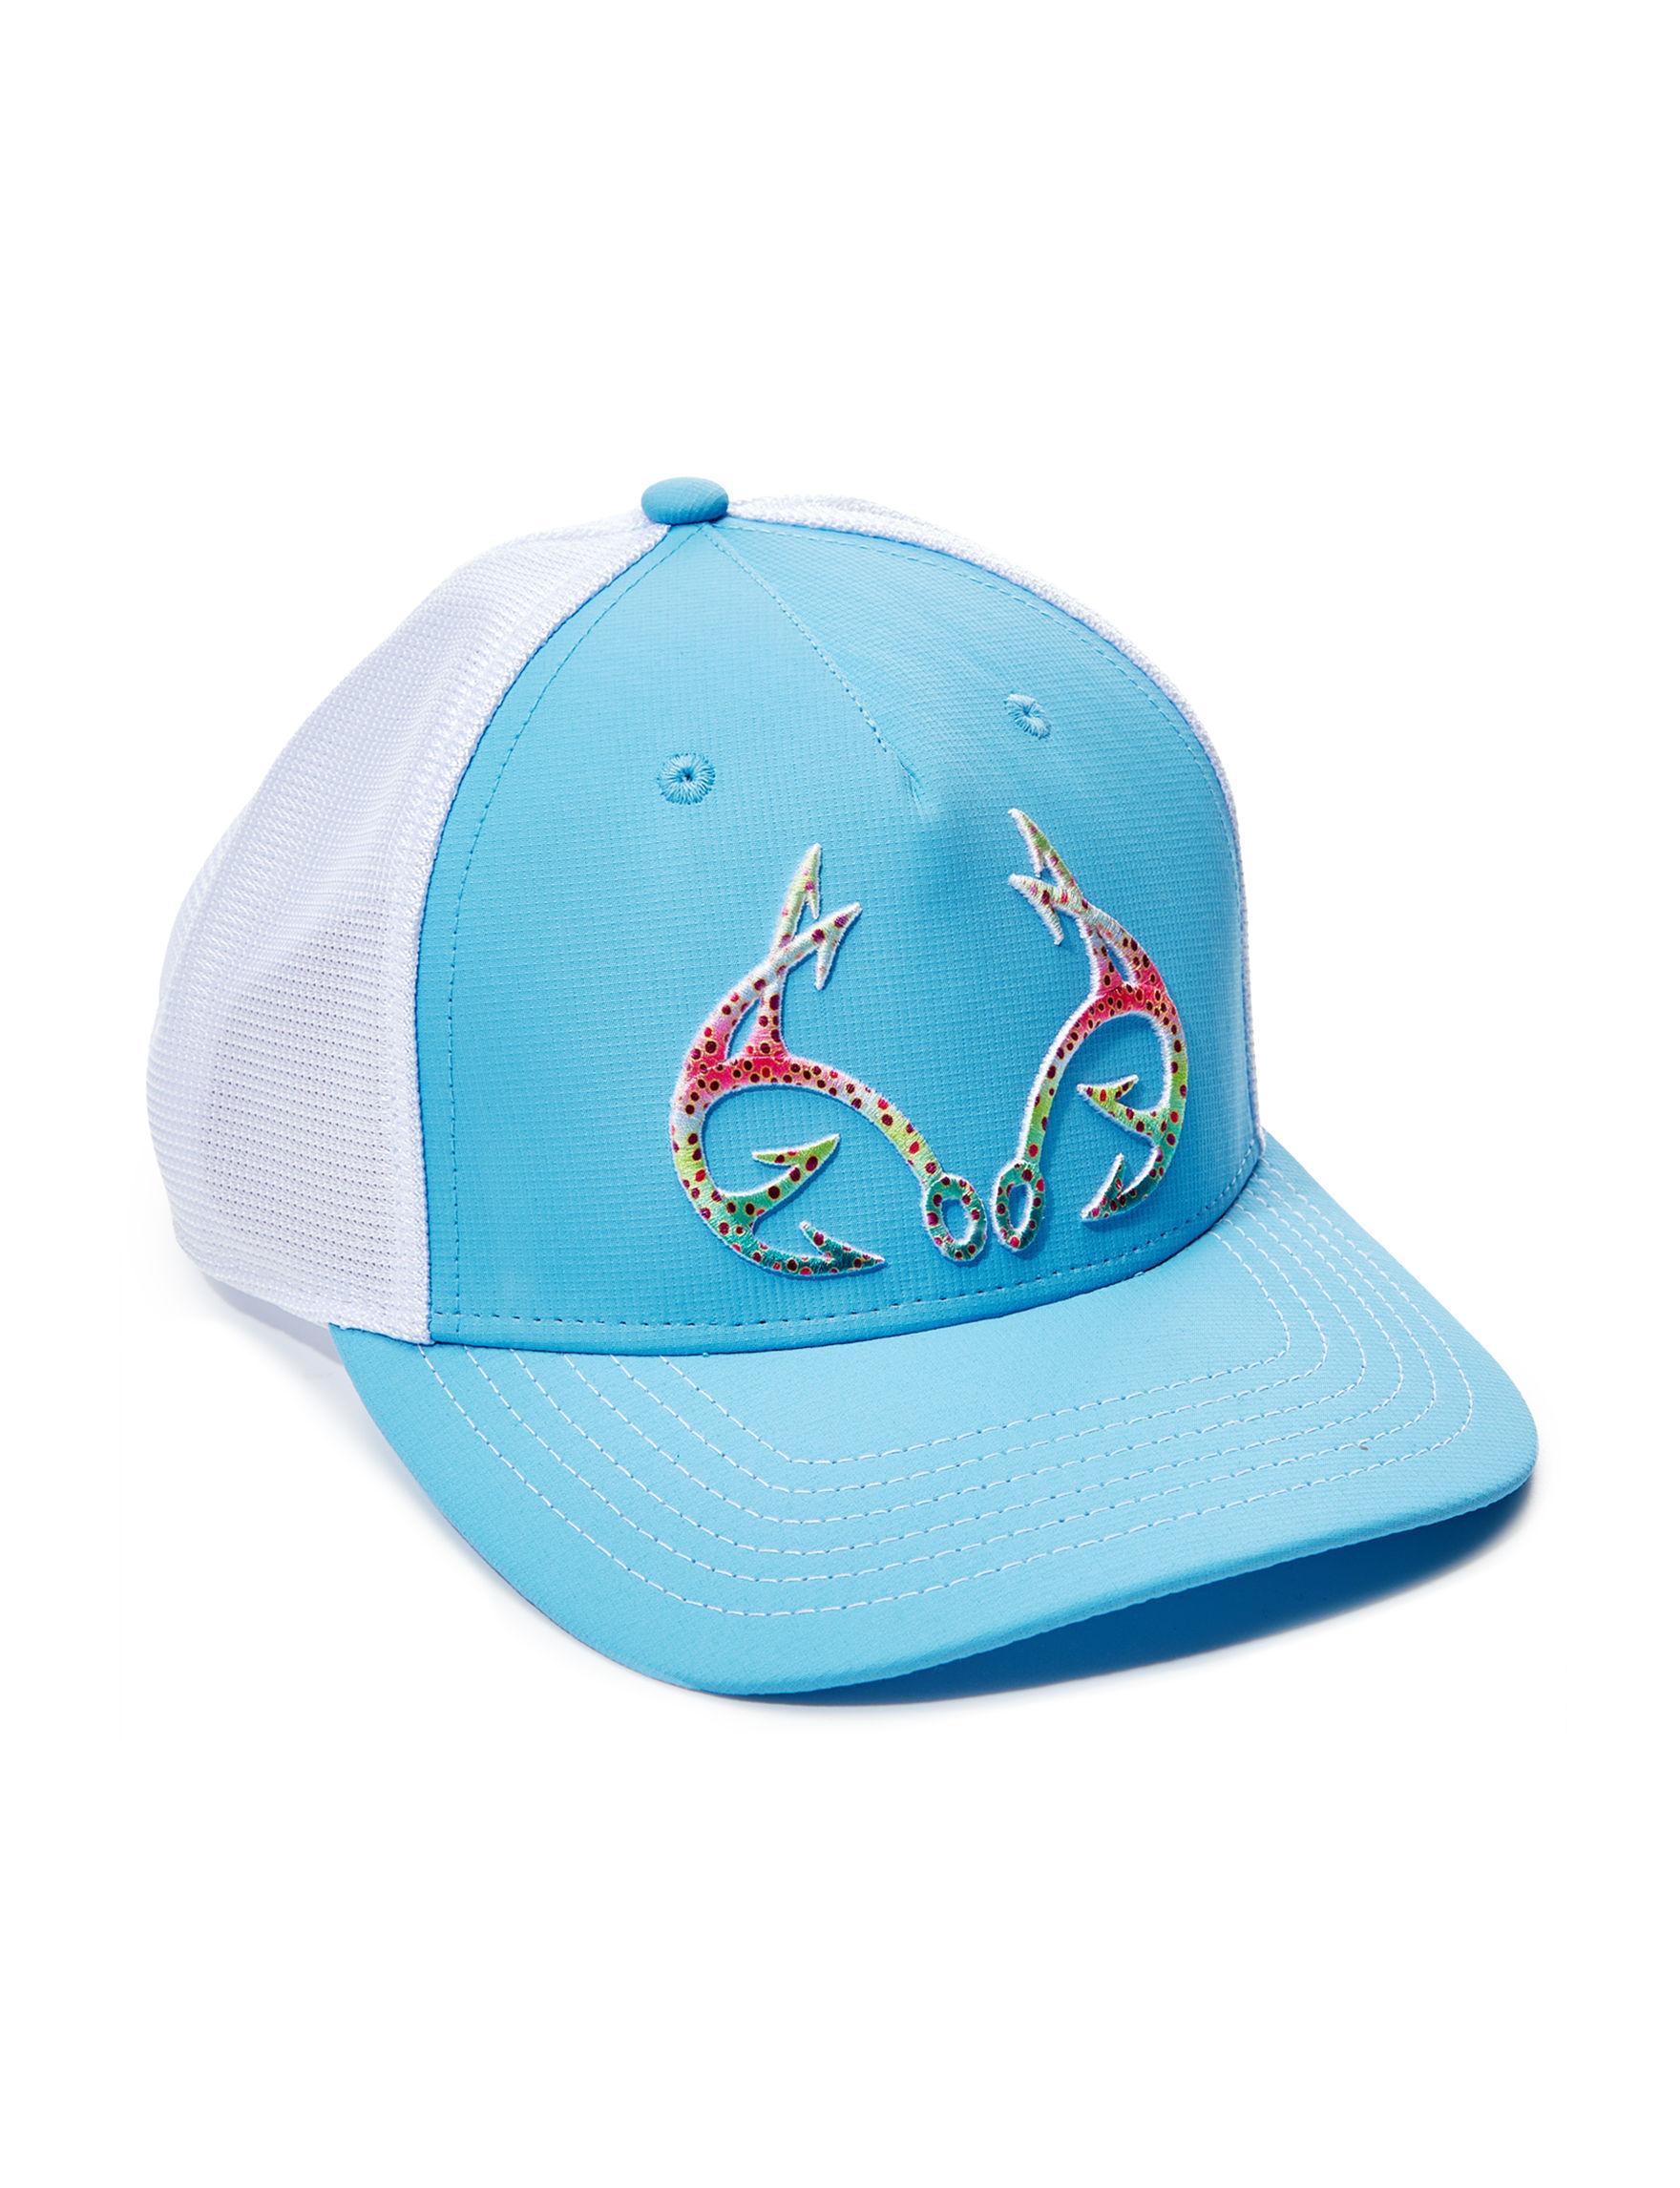 Realtree Light Blue / White Hats & Headwear Baseball Caps